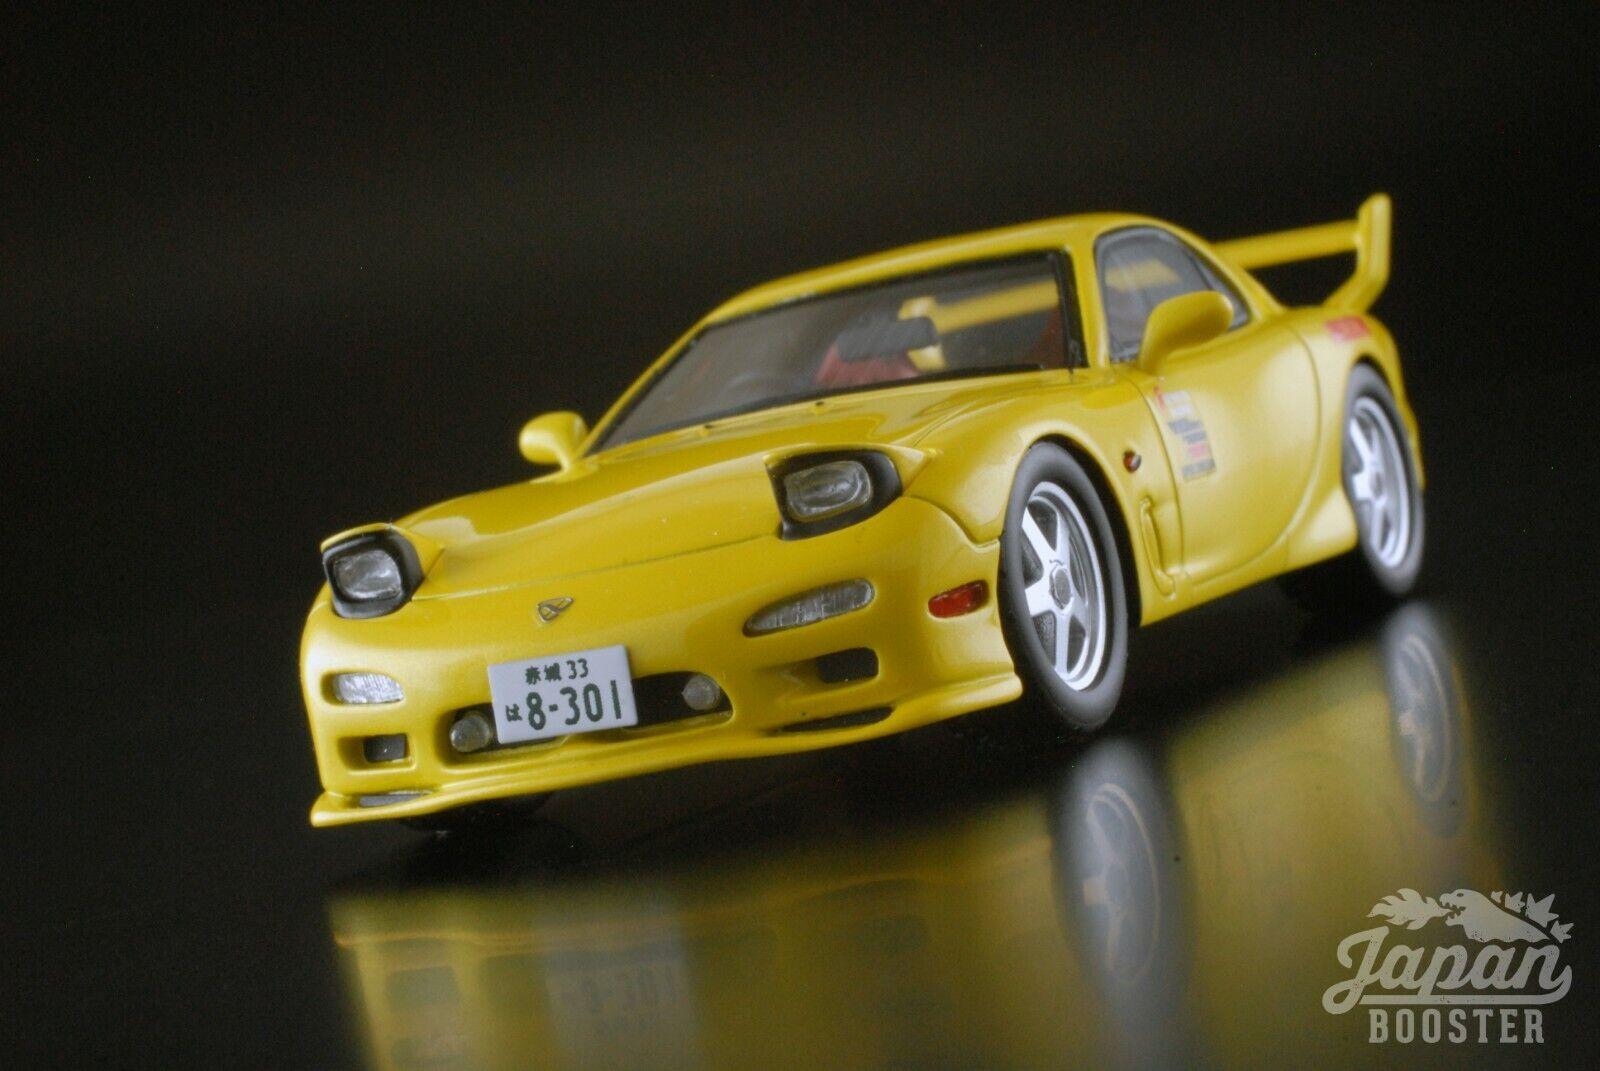 [Modeler's 1 43 MD43226] Initial D Mazda RX-7 FD3S Legend3 (Keisuke Takahashi)